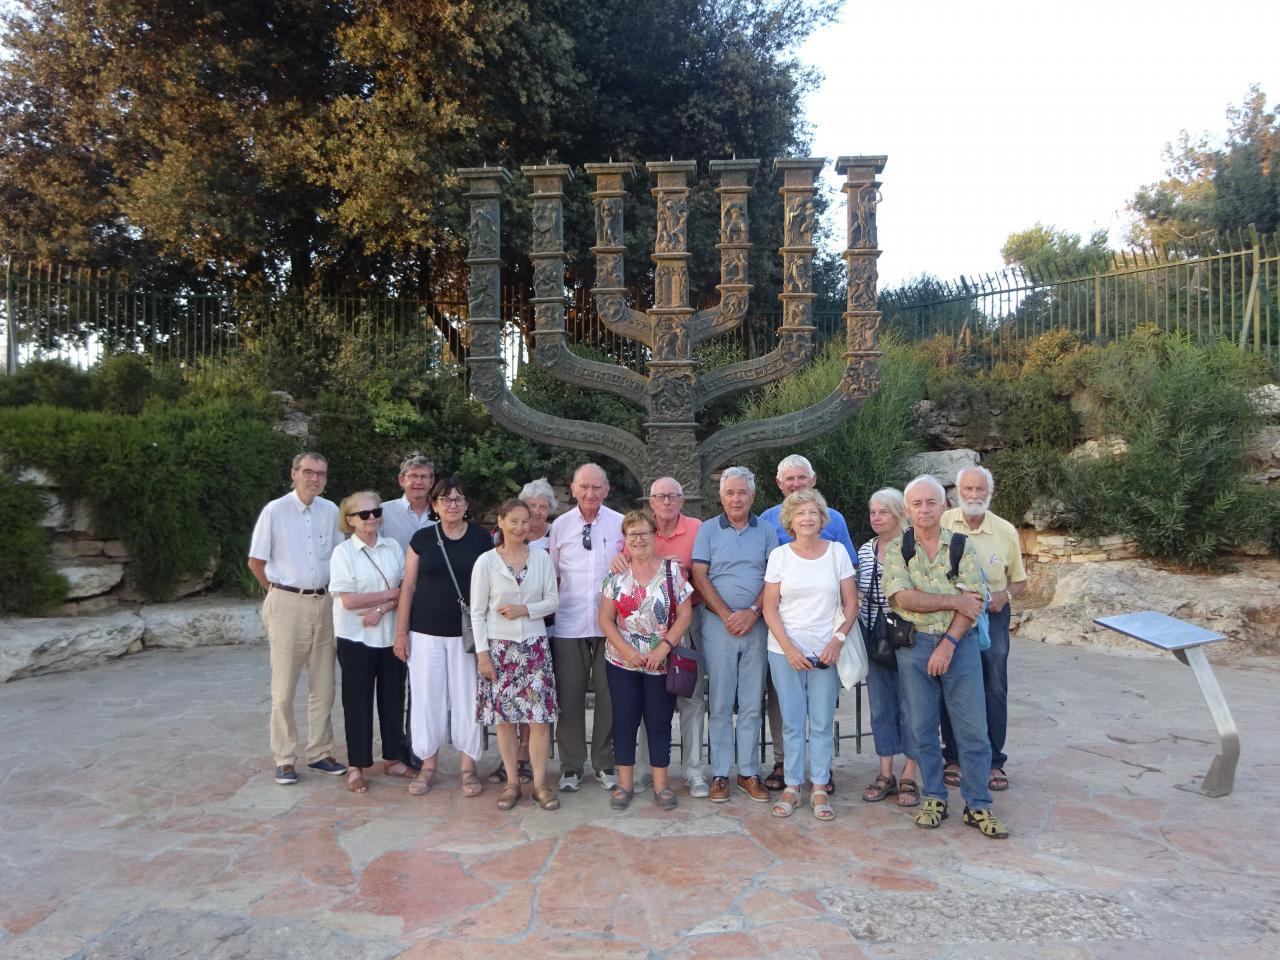 1-Groupe Loti devant la Menorah, emblème de l'Etat d'Israël-1